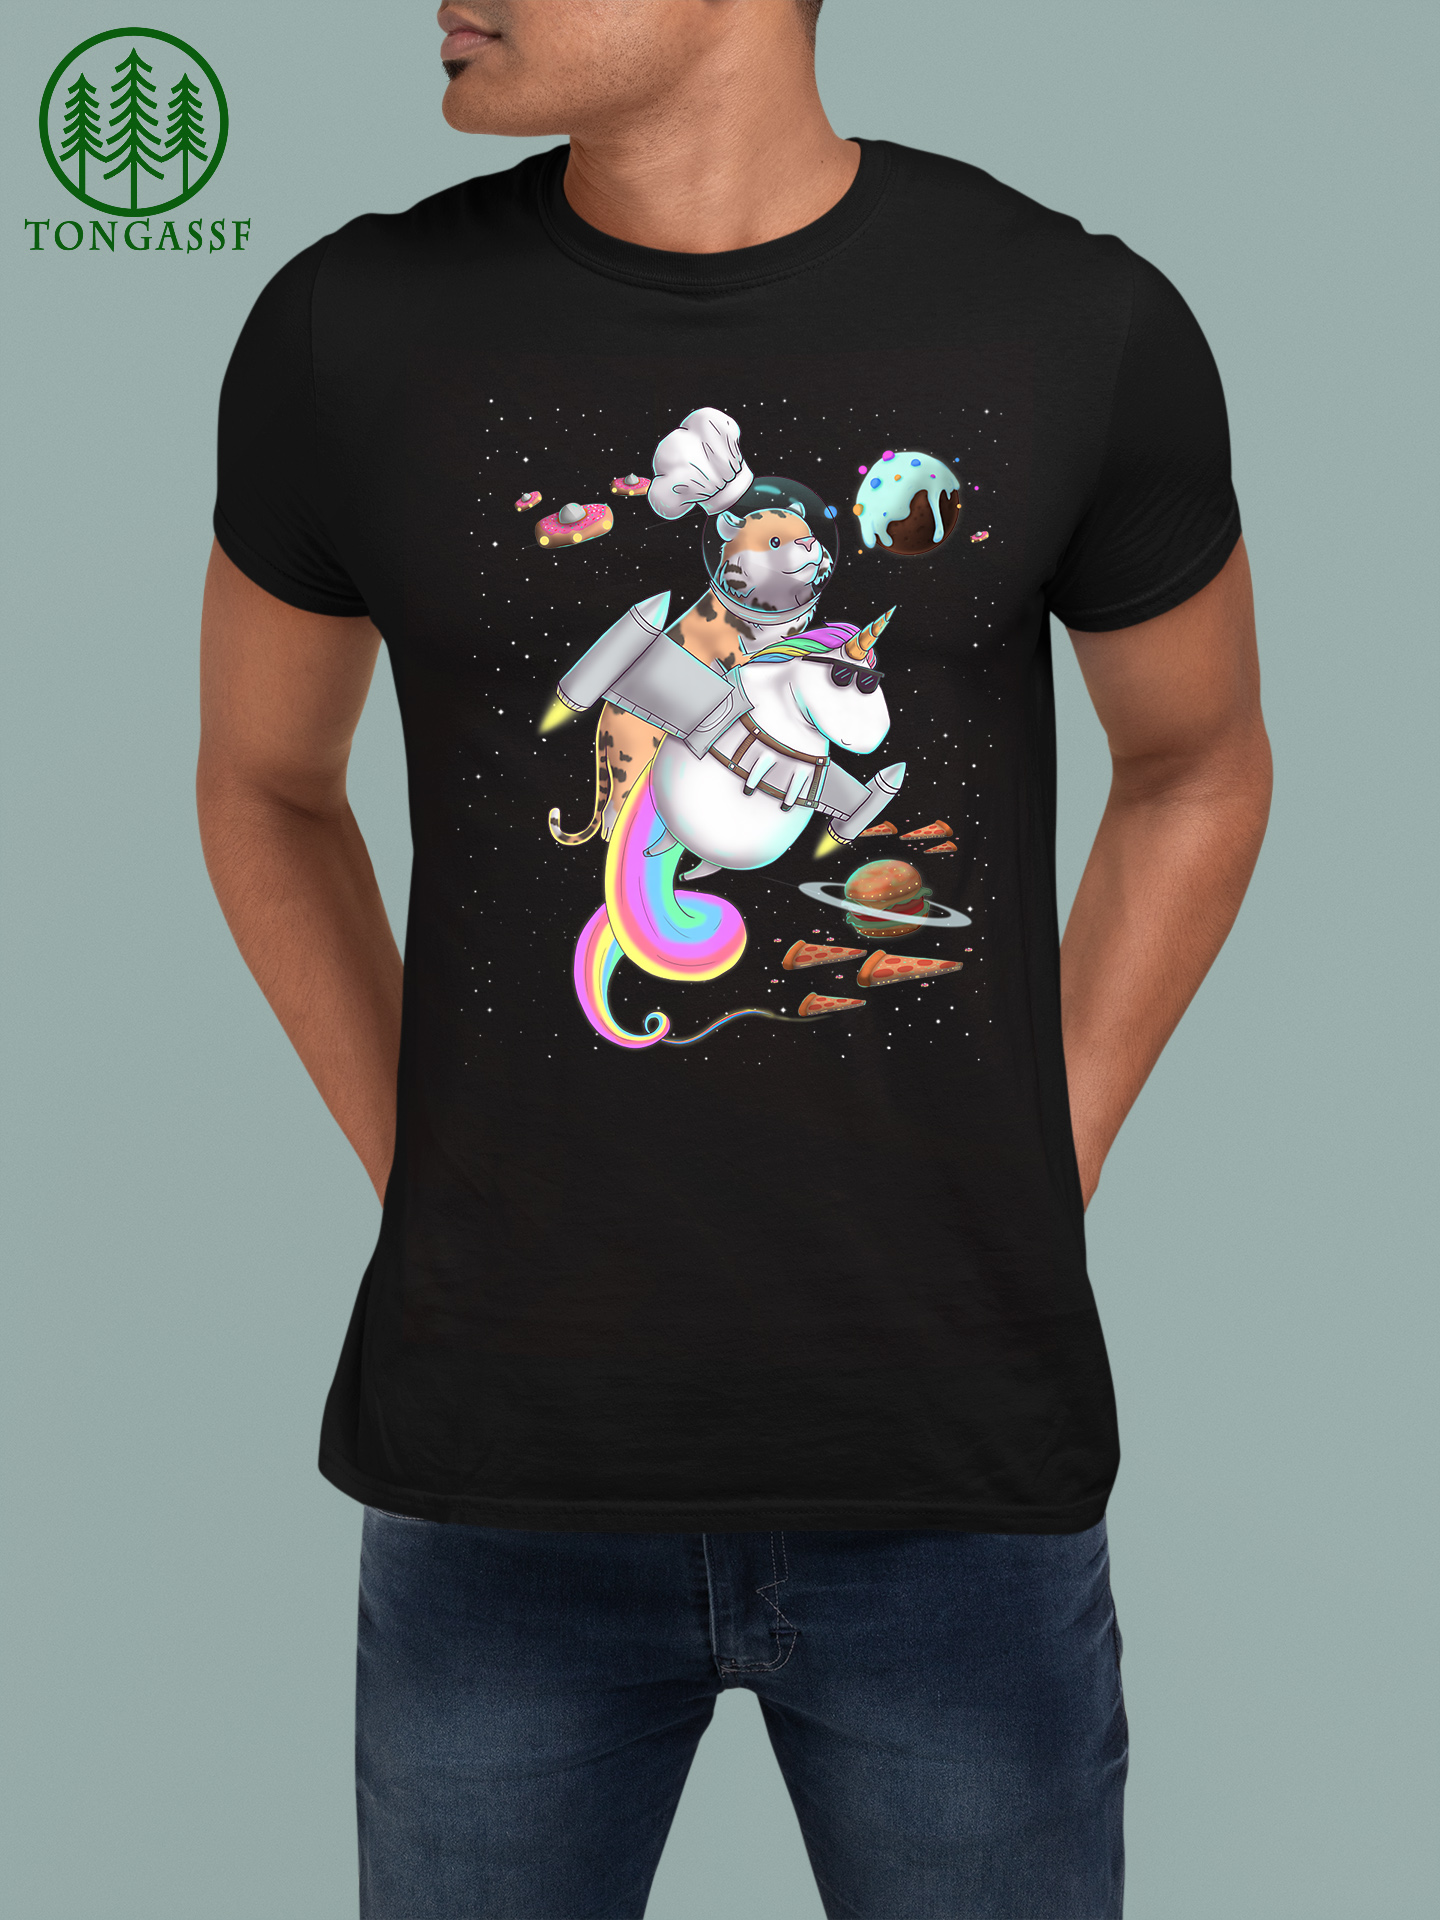 Tiger Cat Riding Unicorn Food Pizza Space Party Planet Cute Premium T Shirt